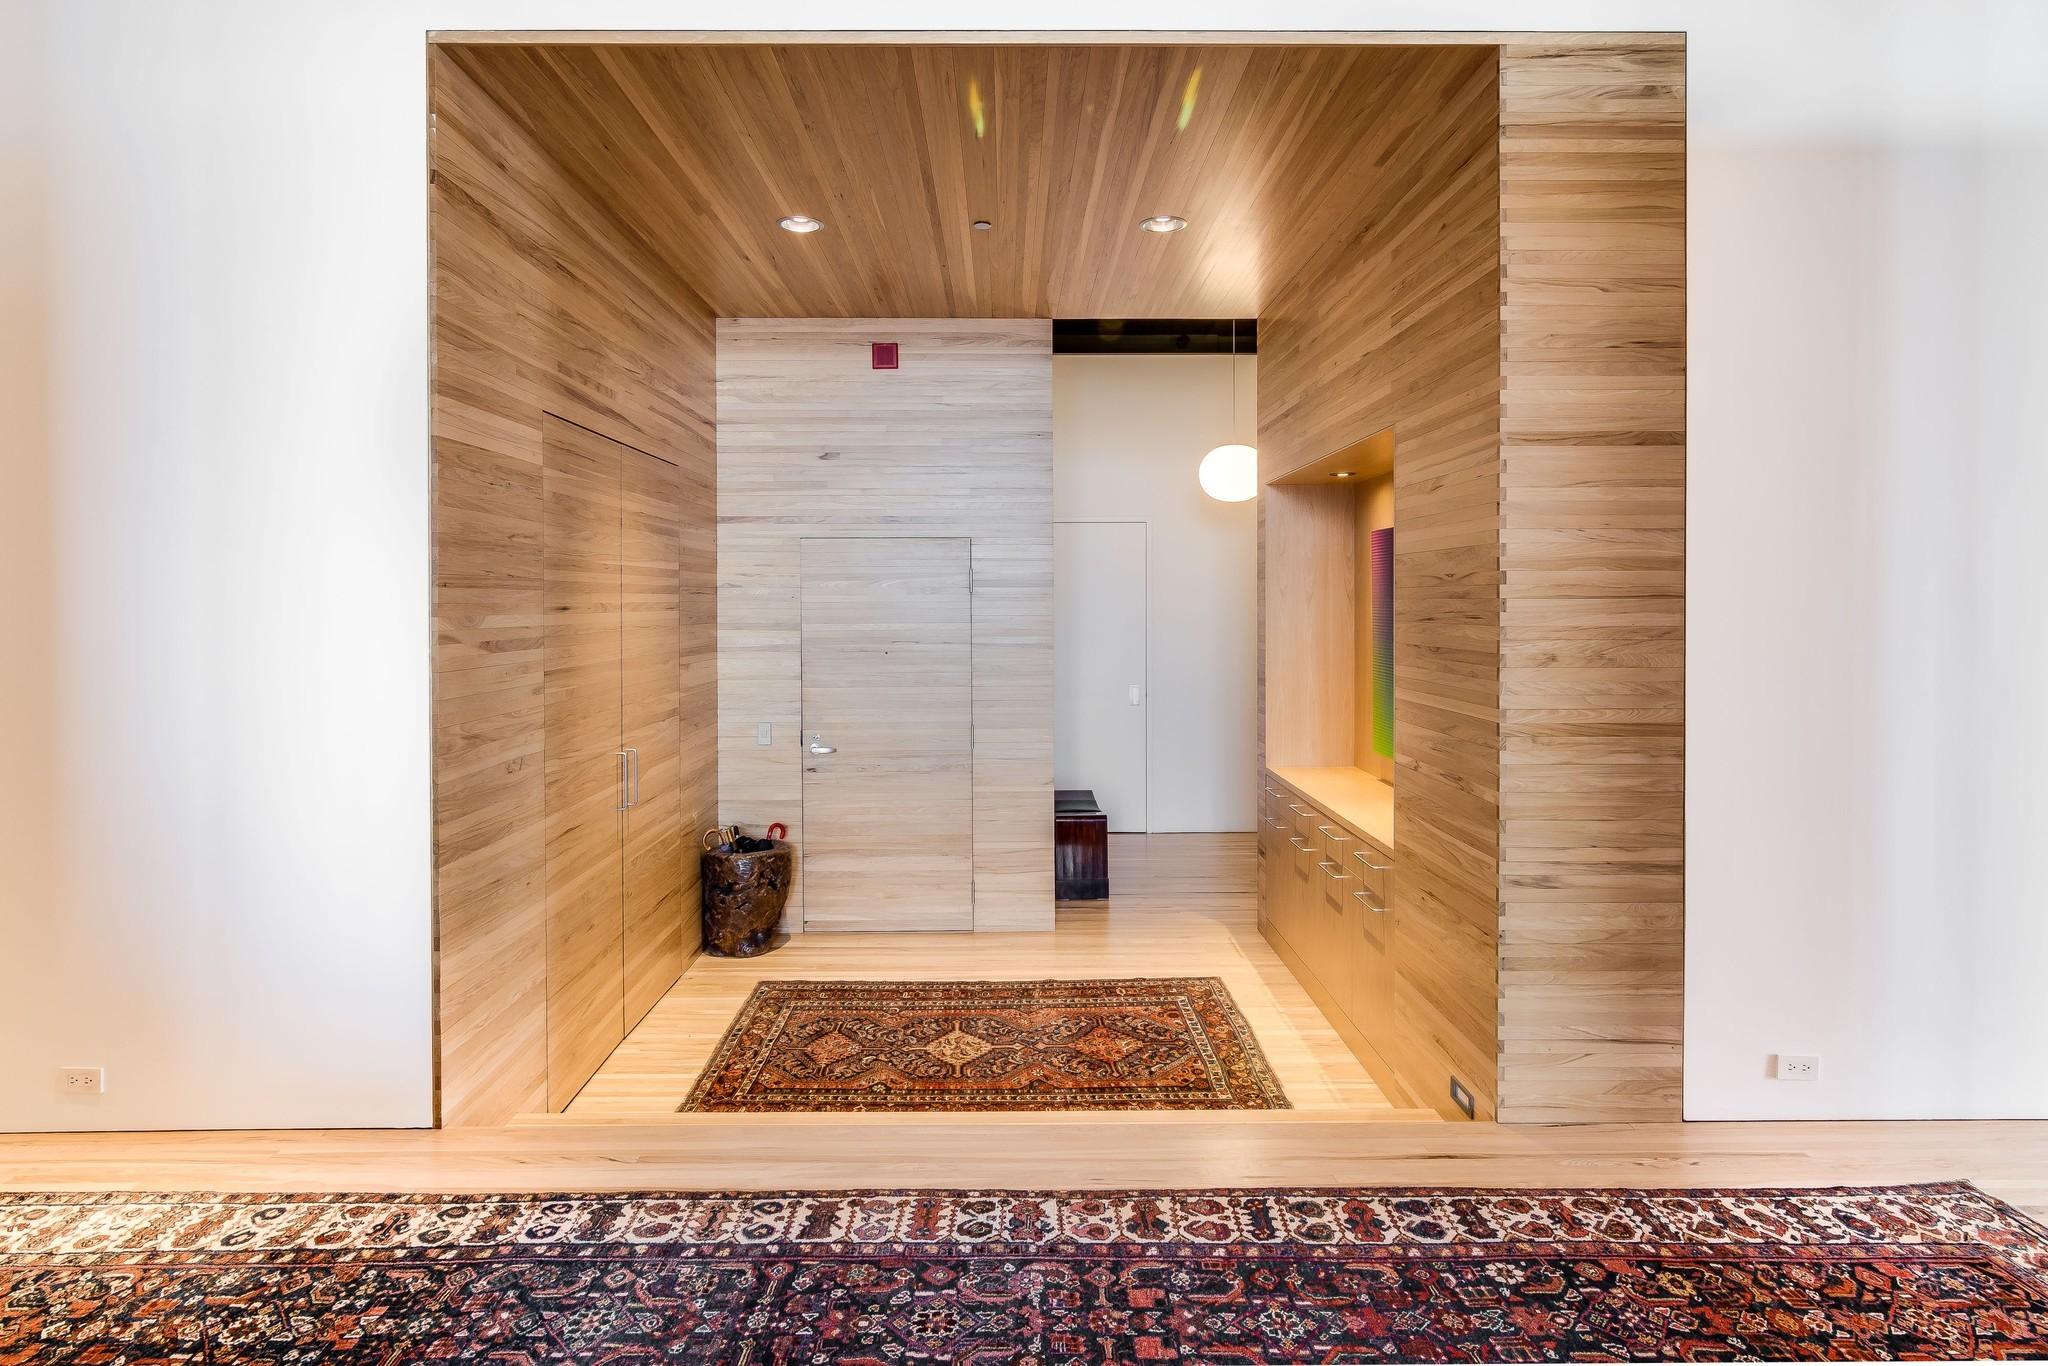 Chicago loft with three parking spots, wine cellar: $3.8M